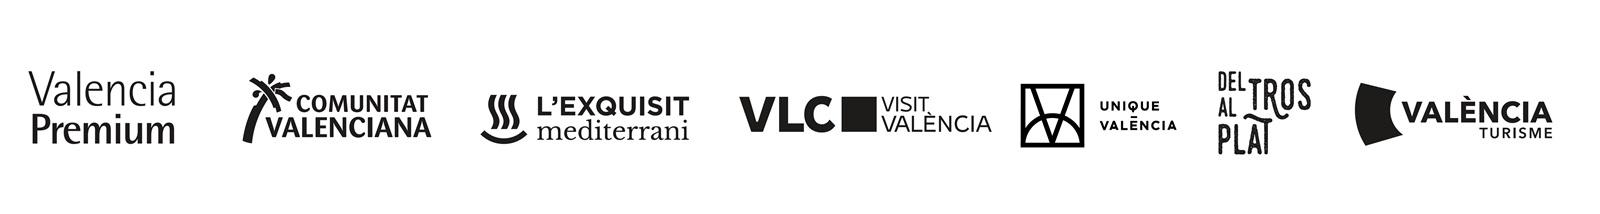 Valencia culinary festival 2020